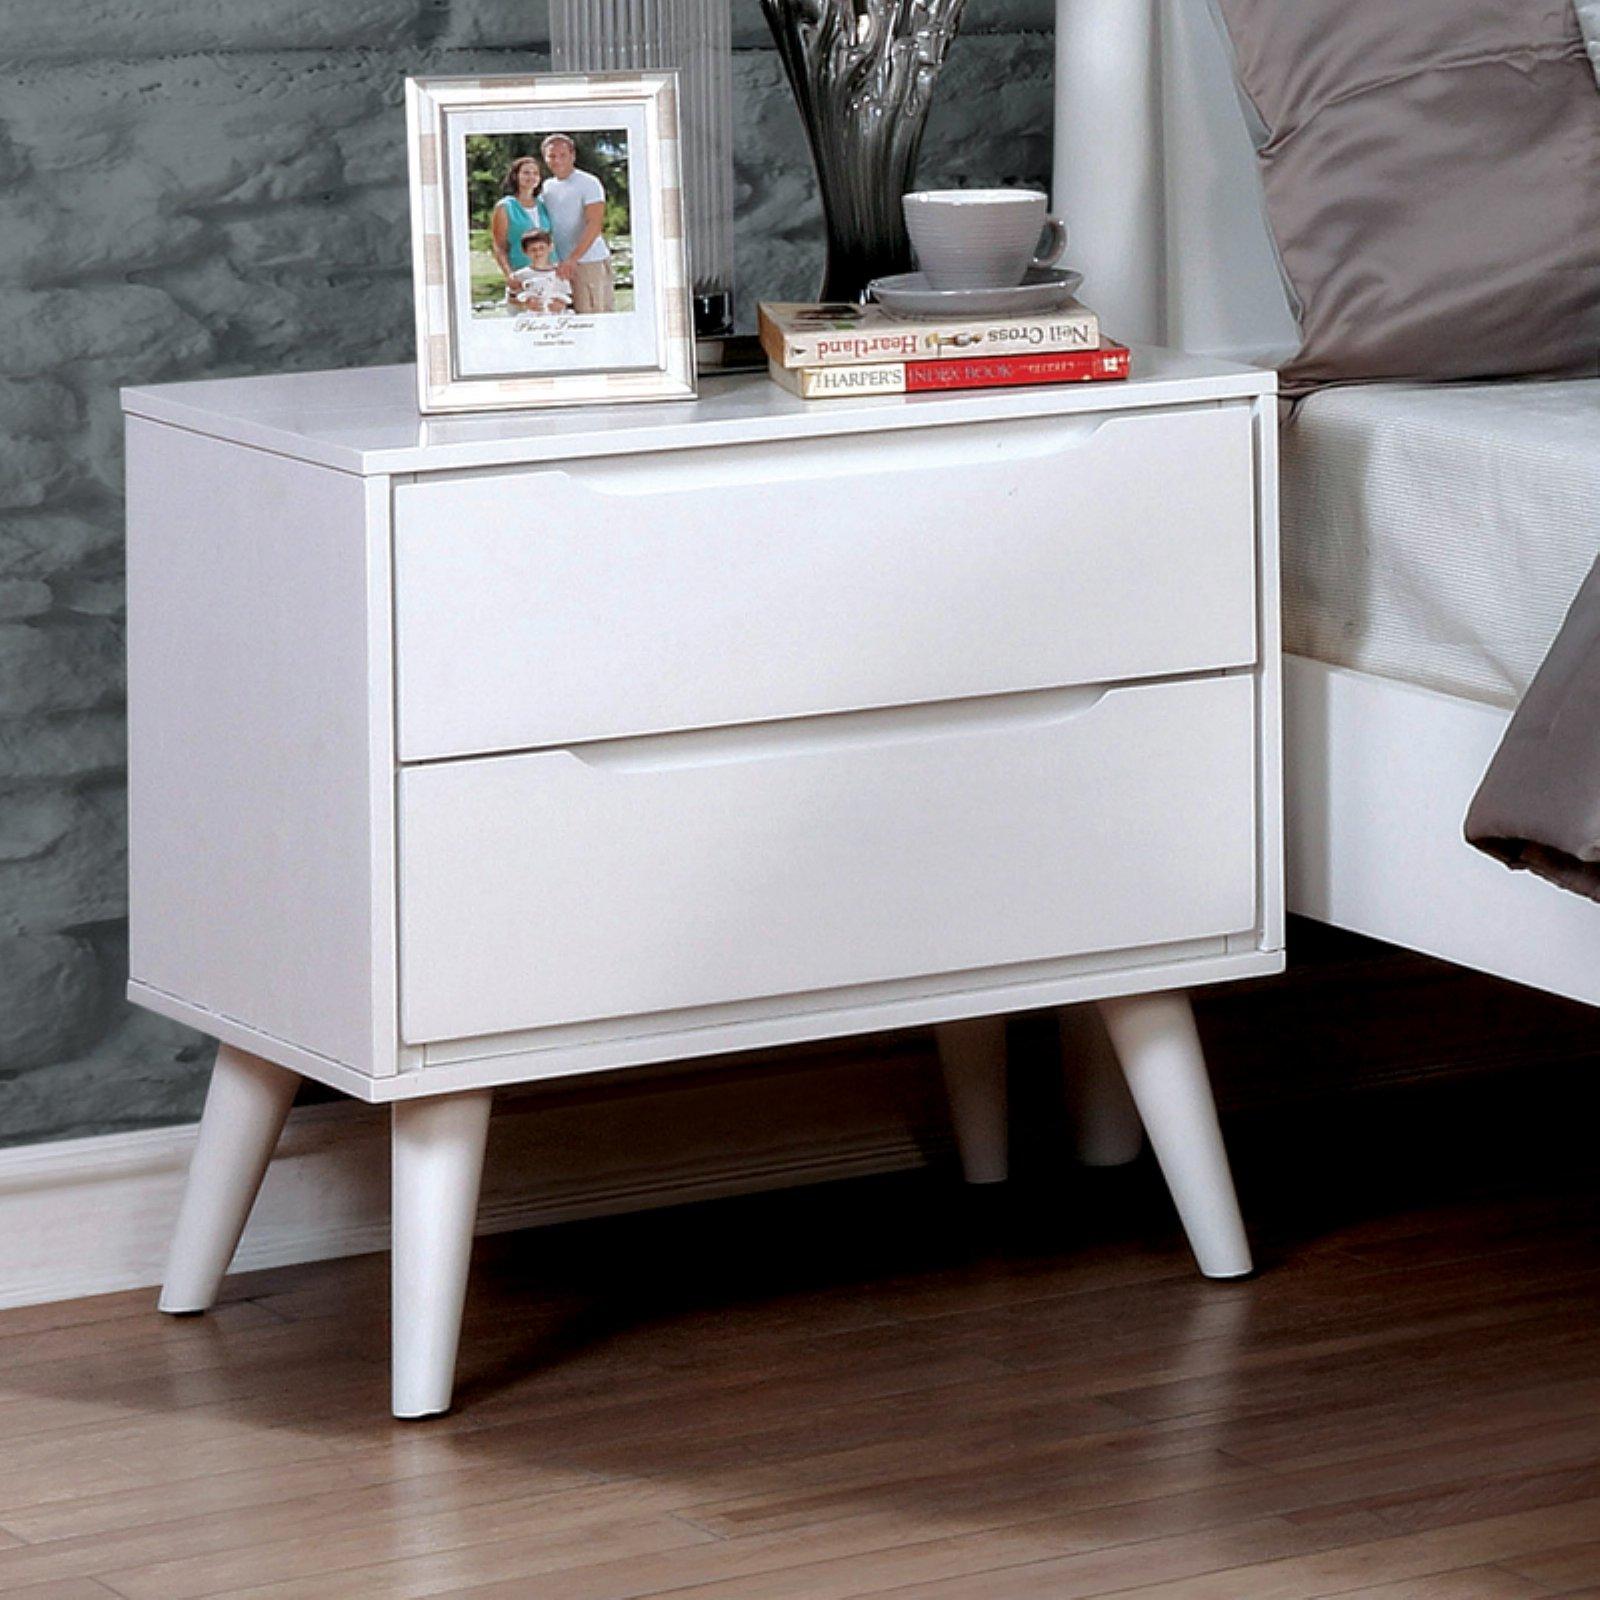 Furniture of America Stewart I Mid-Century Modern 2-Drawer Nightstand